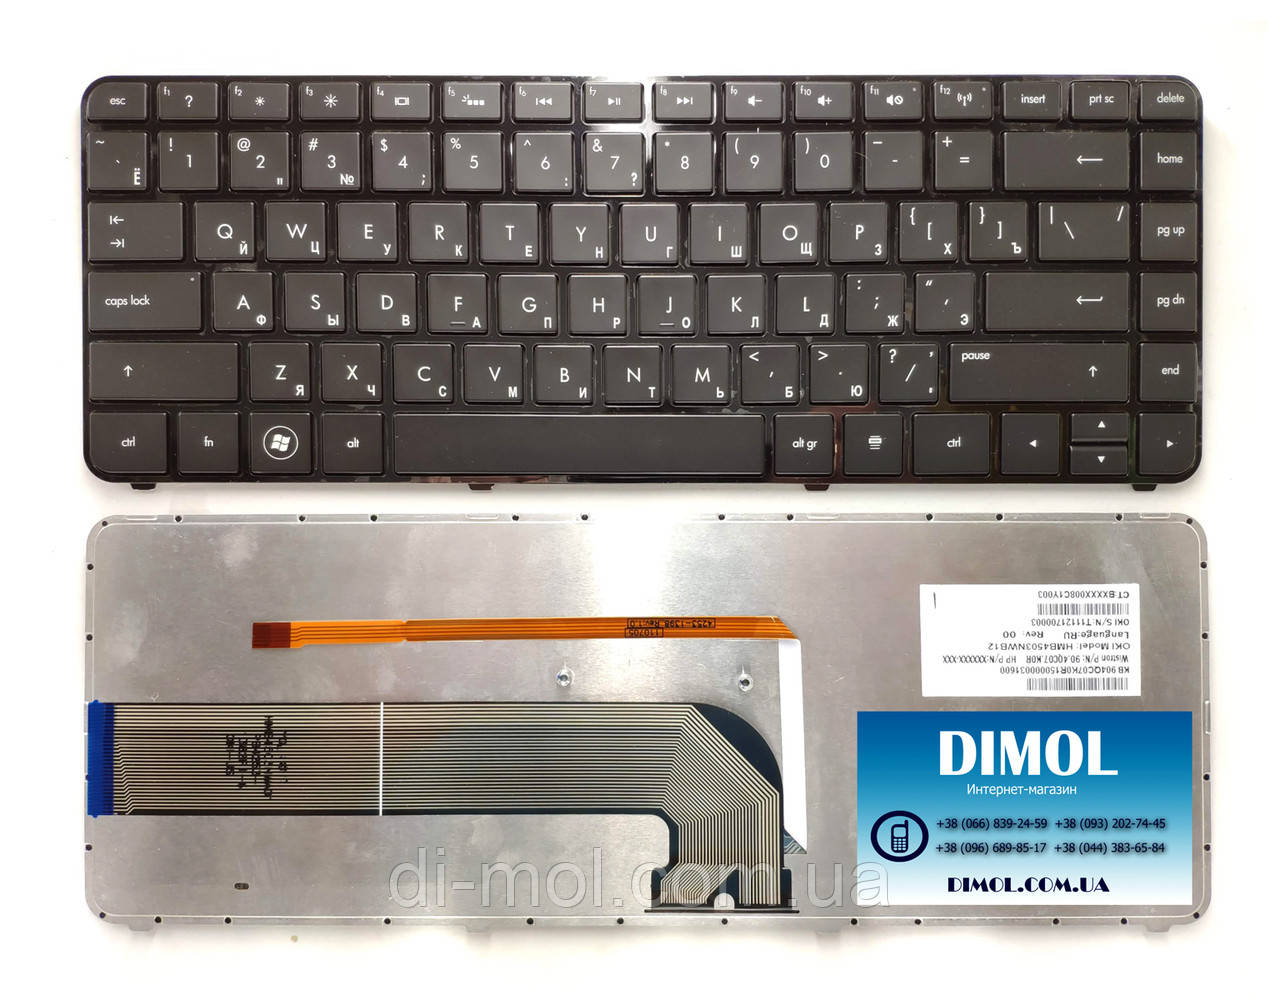 Оригинальная клавиатура для ноутбука HP Pavilion dm4-3000, dm4t-3000, dm4-3000tx series, black, ru, подсветка